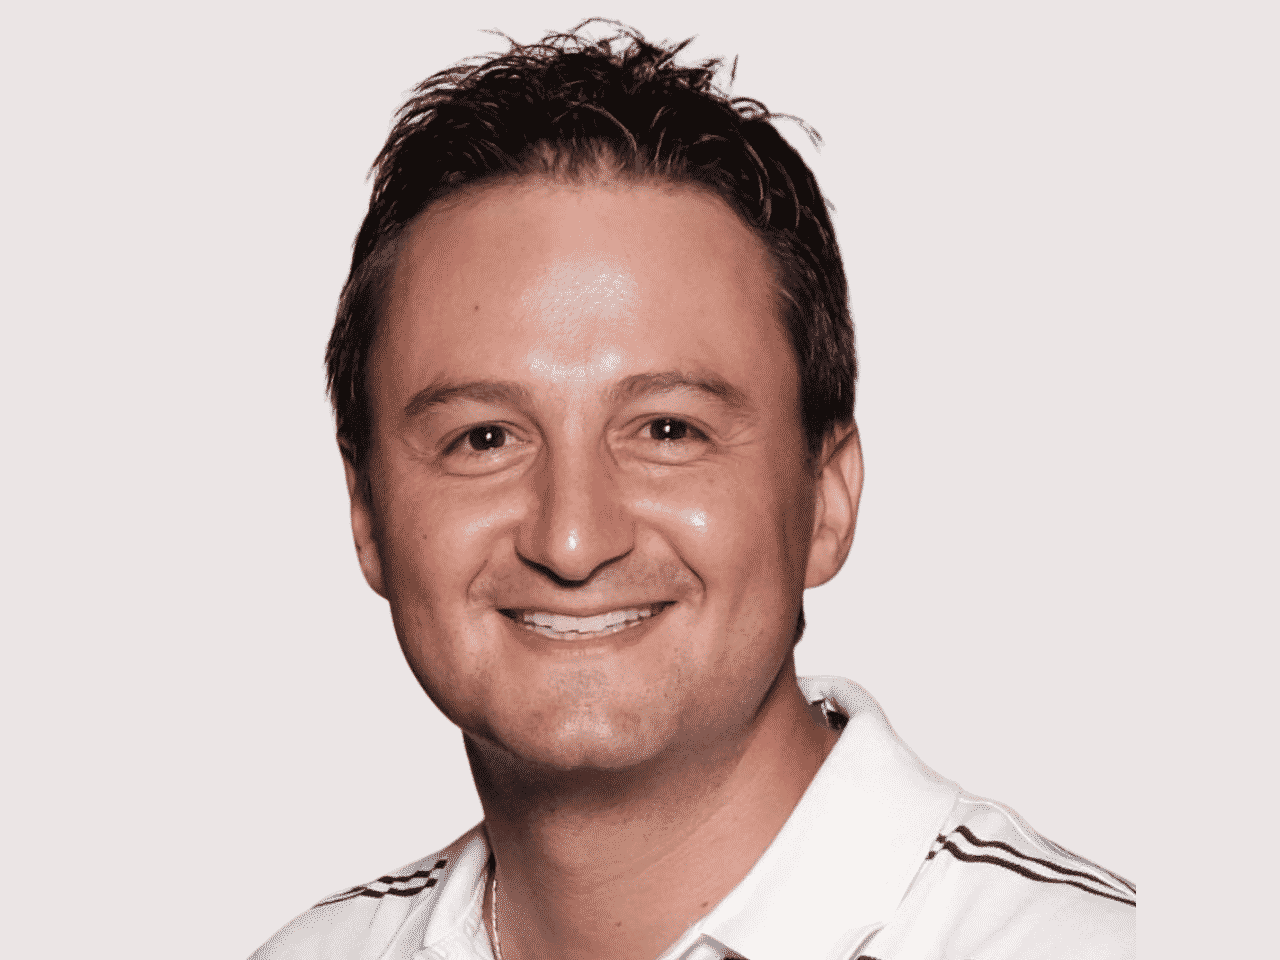 David Buchalter